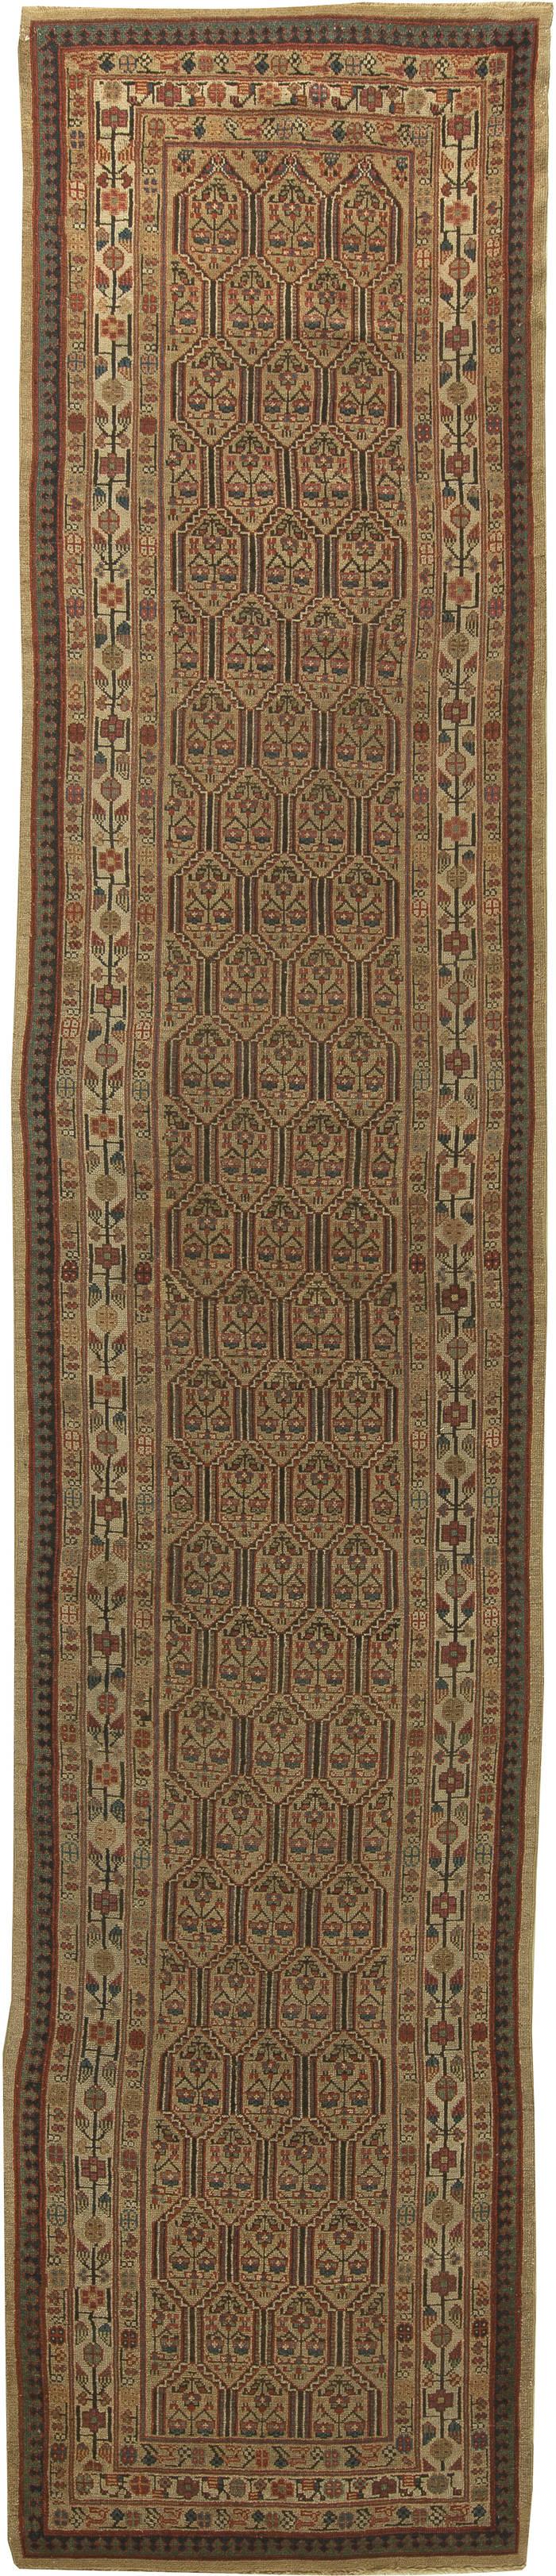 ... Antique Persian Hamadan Rug ...